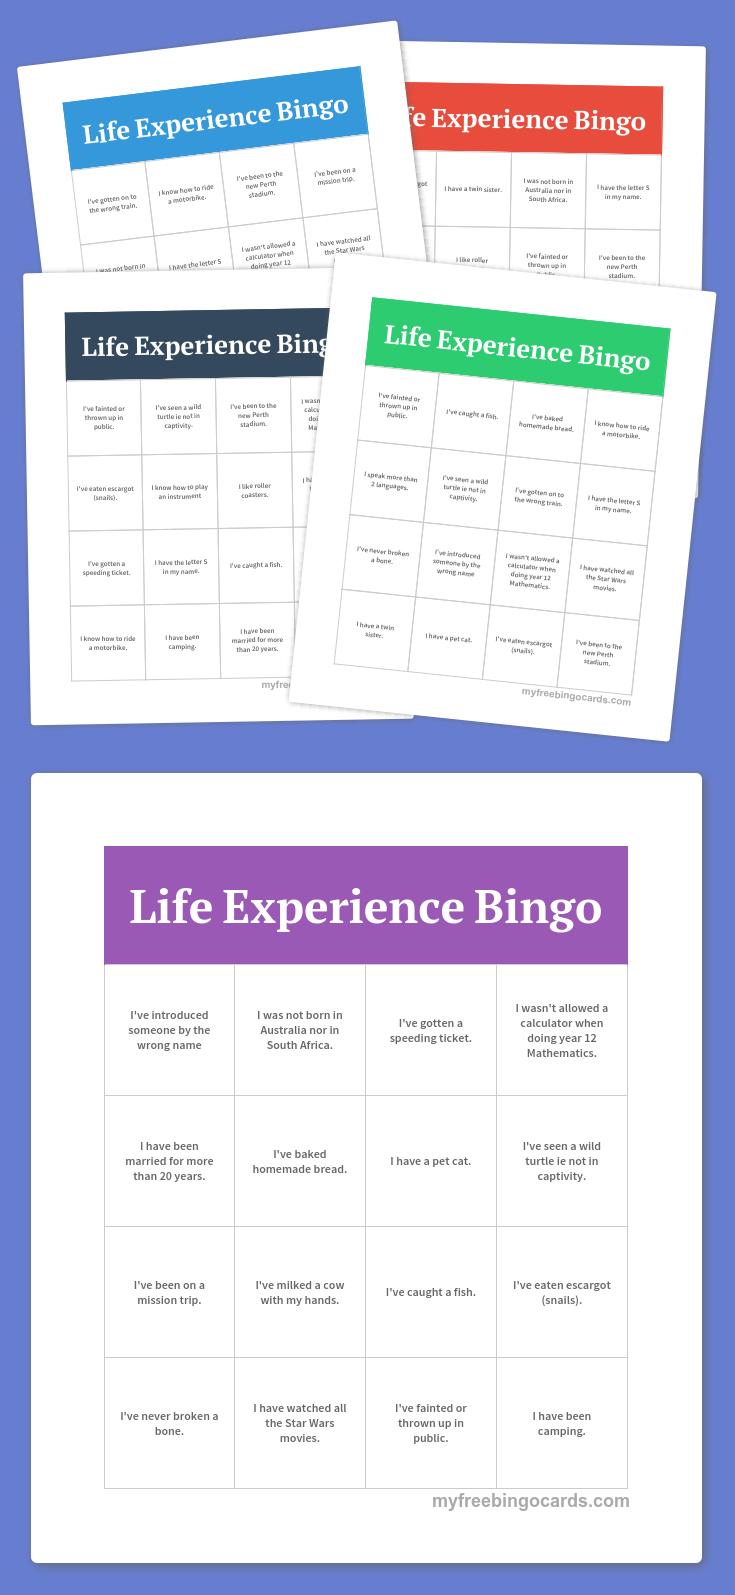 Free Printable Bingo Cards (With Images) | Bingo Printable